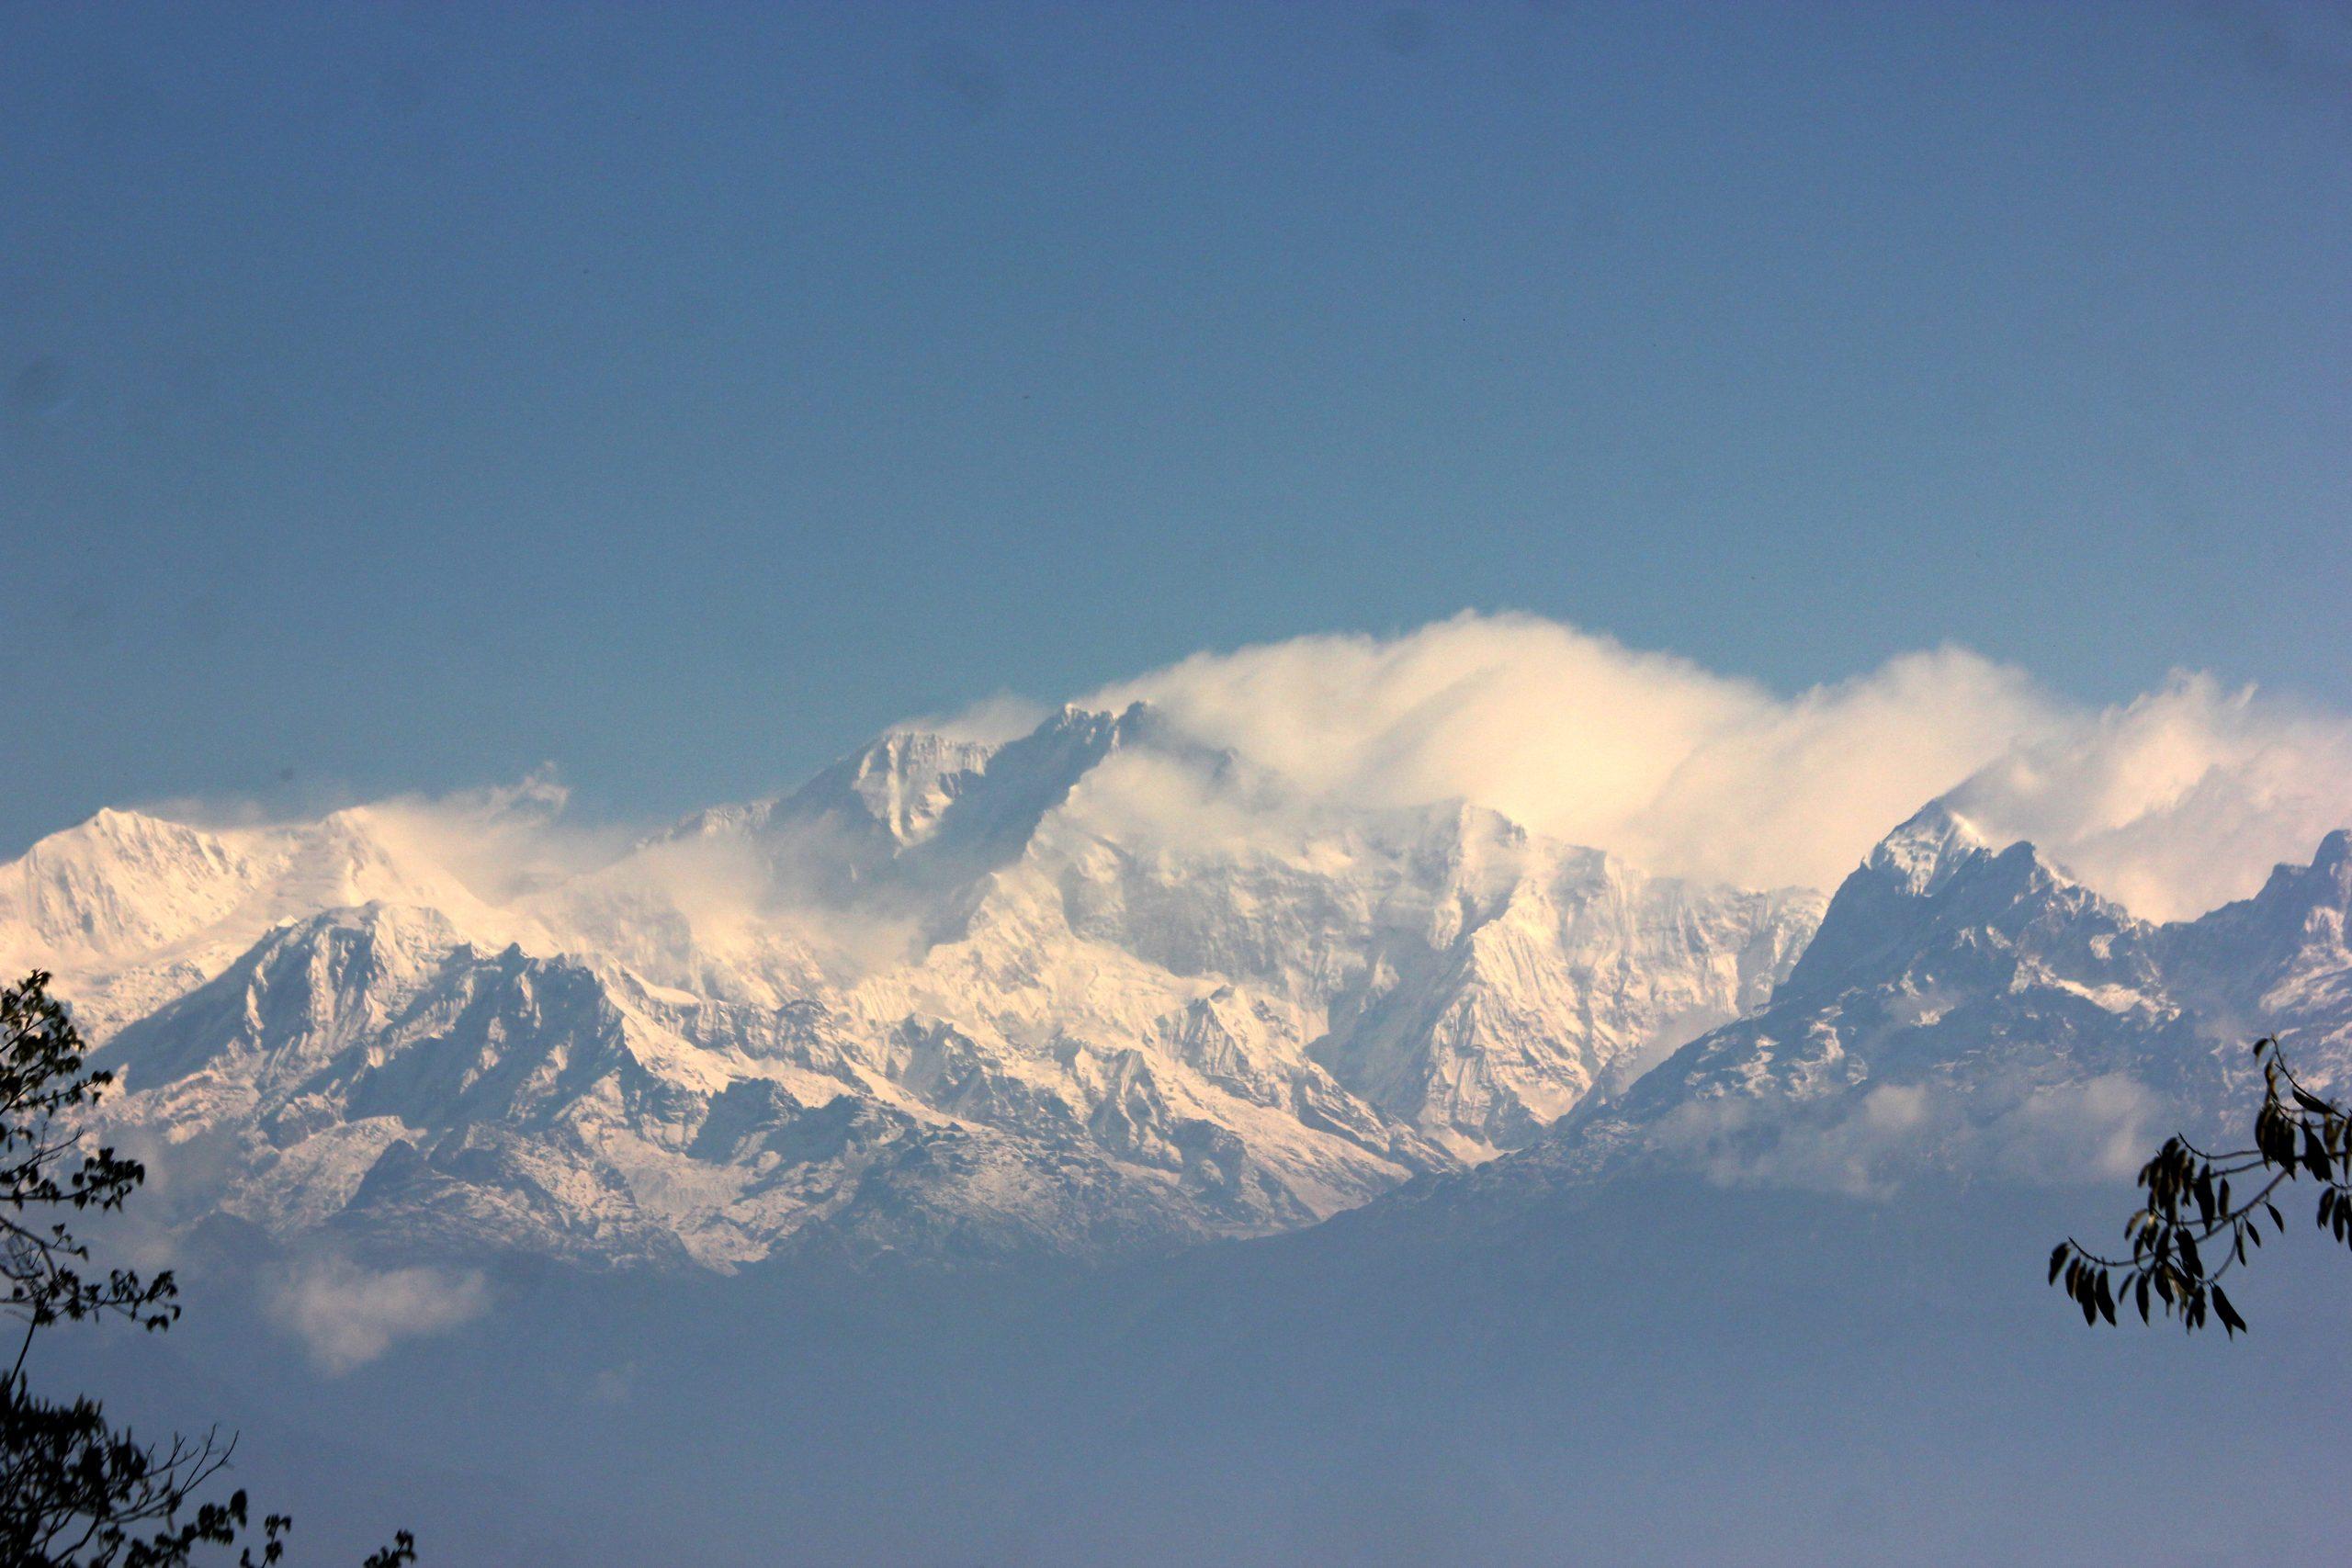 Snowy mountains of Hiamalya